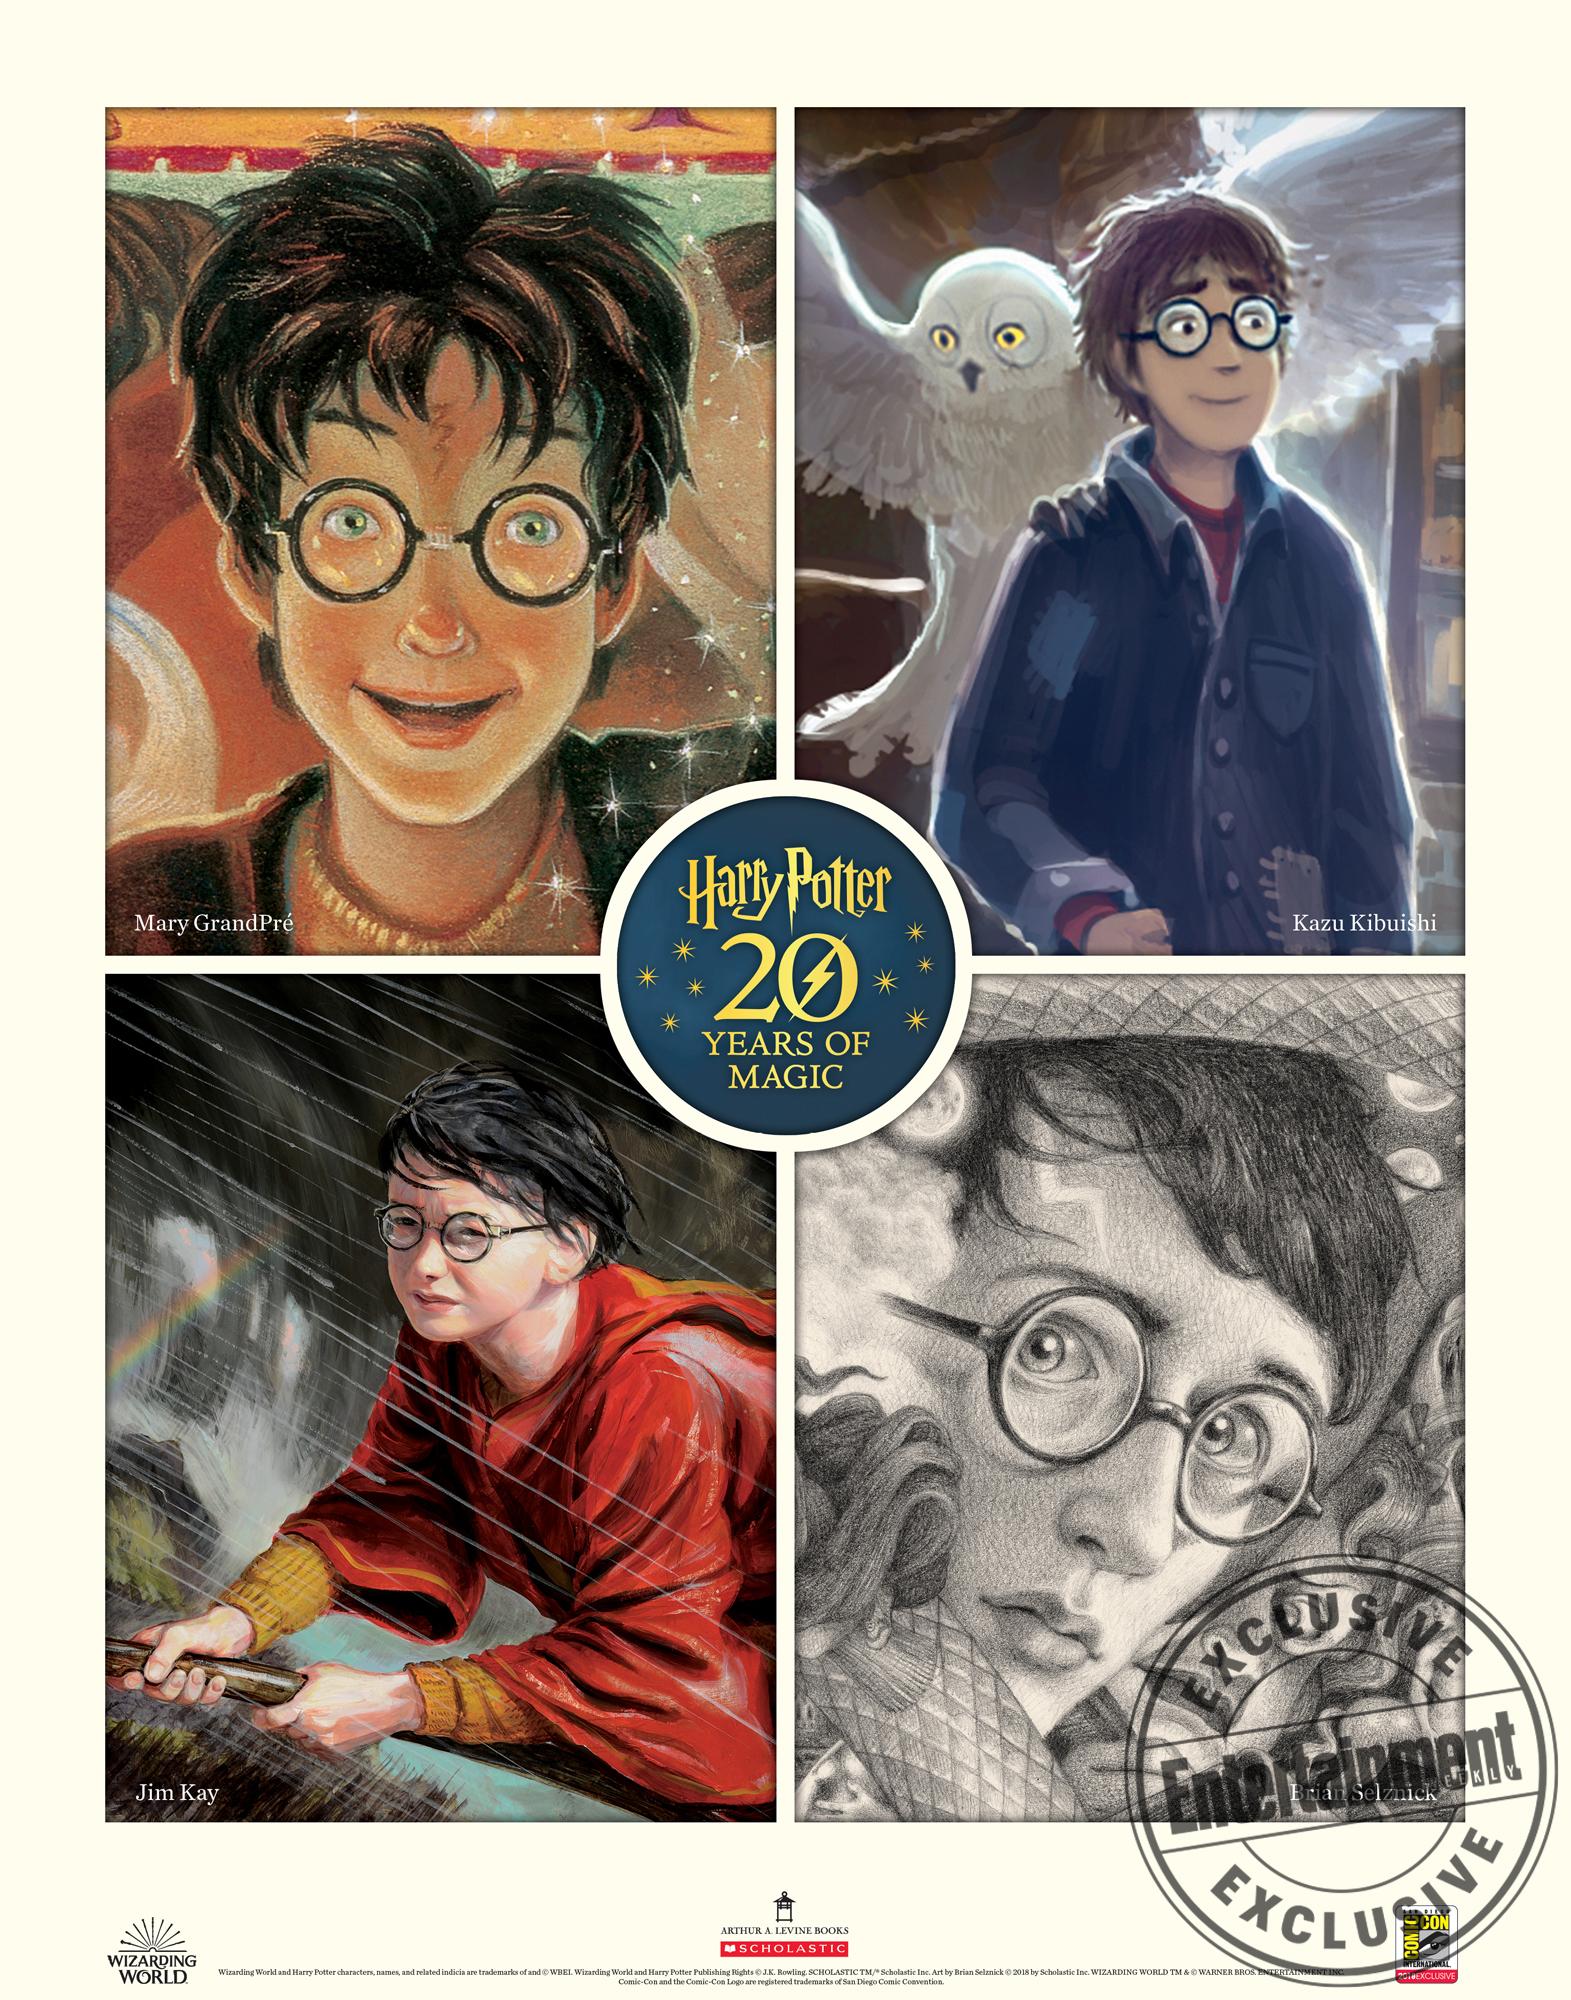 Harry Potter ComicCon graphic